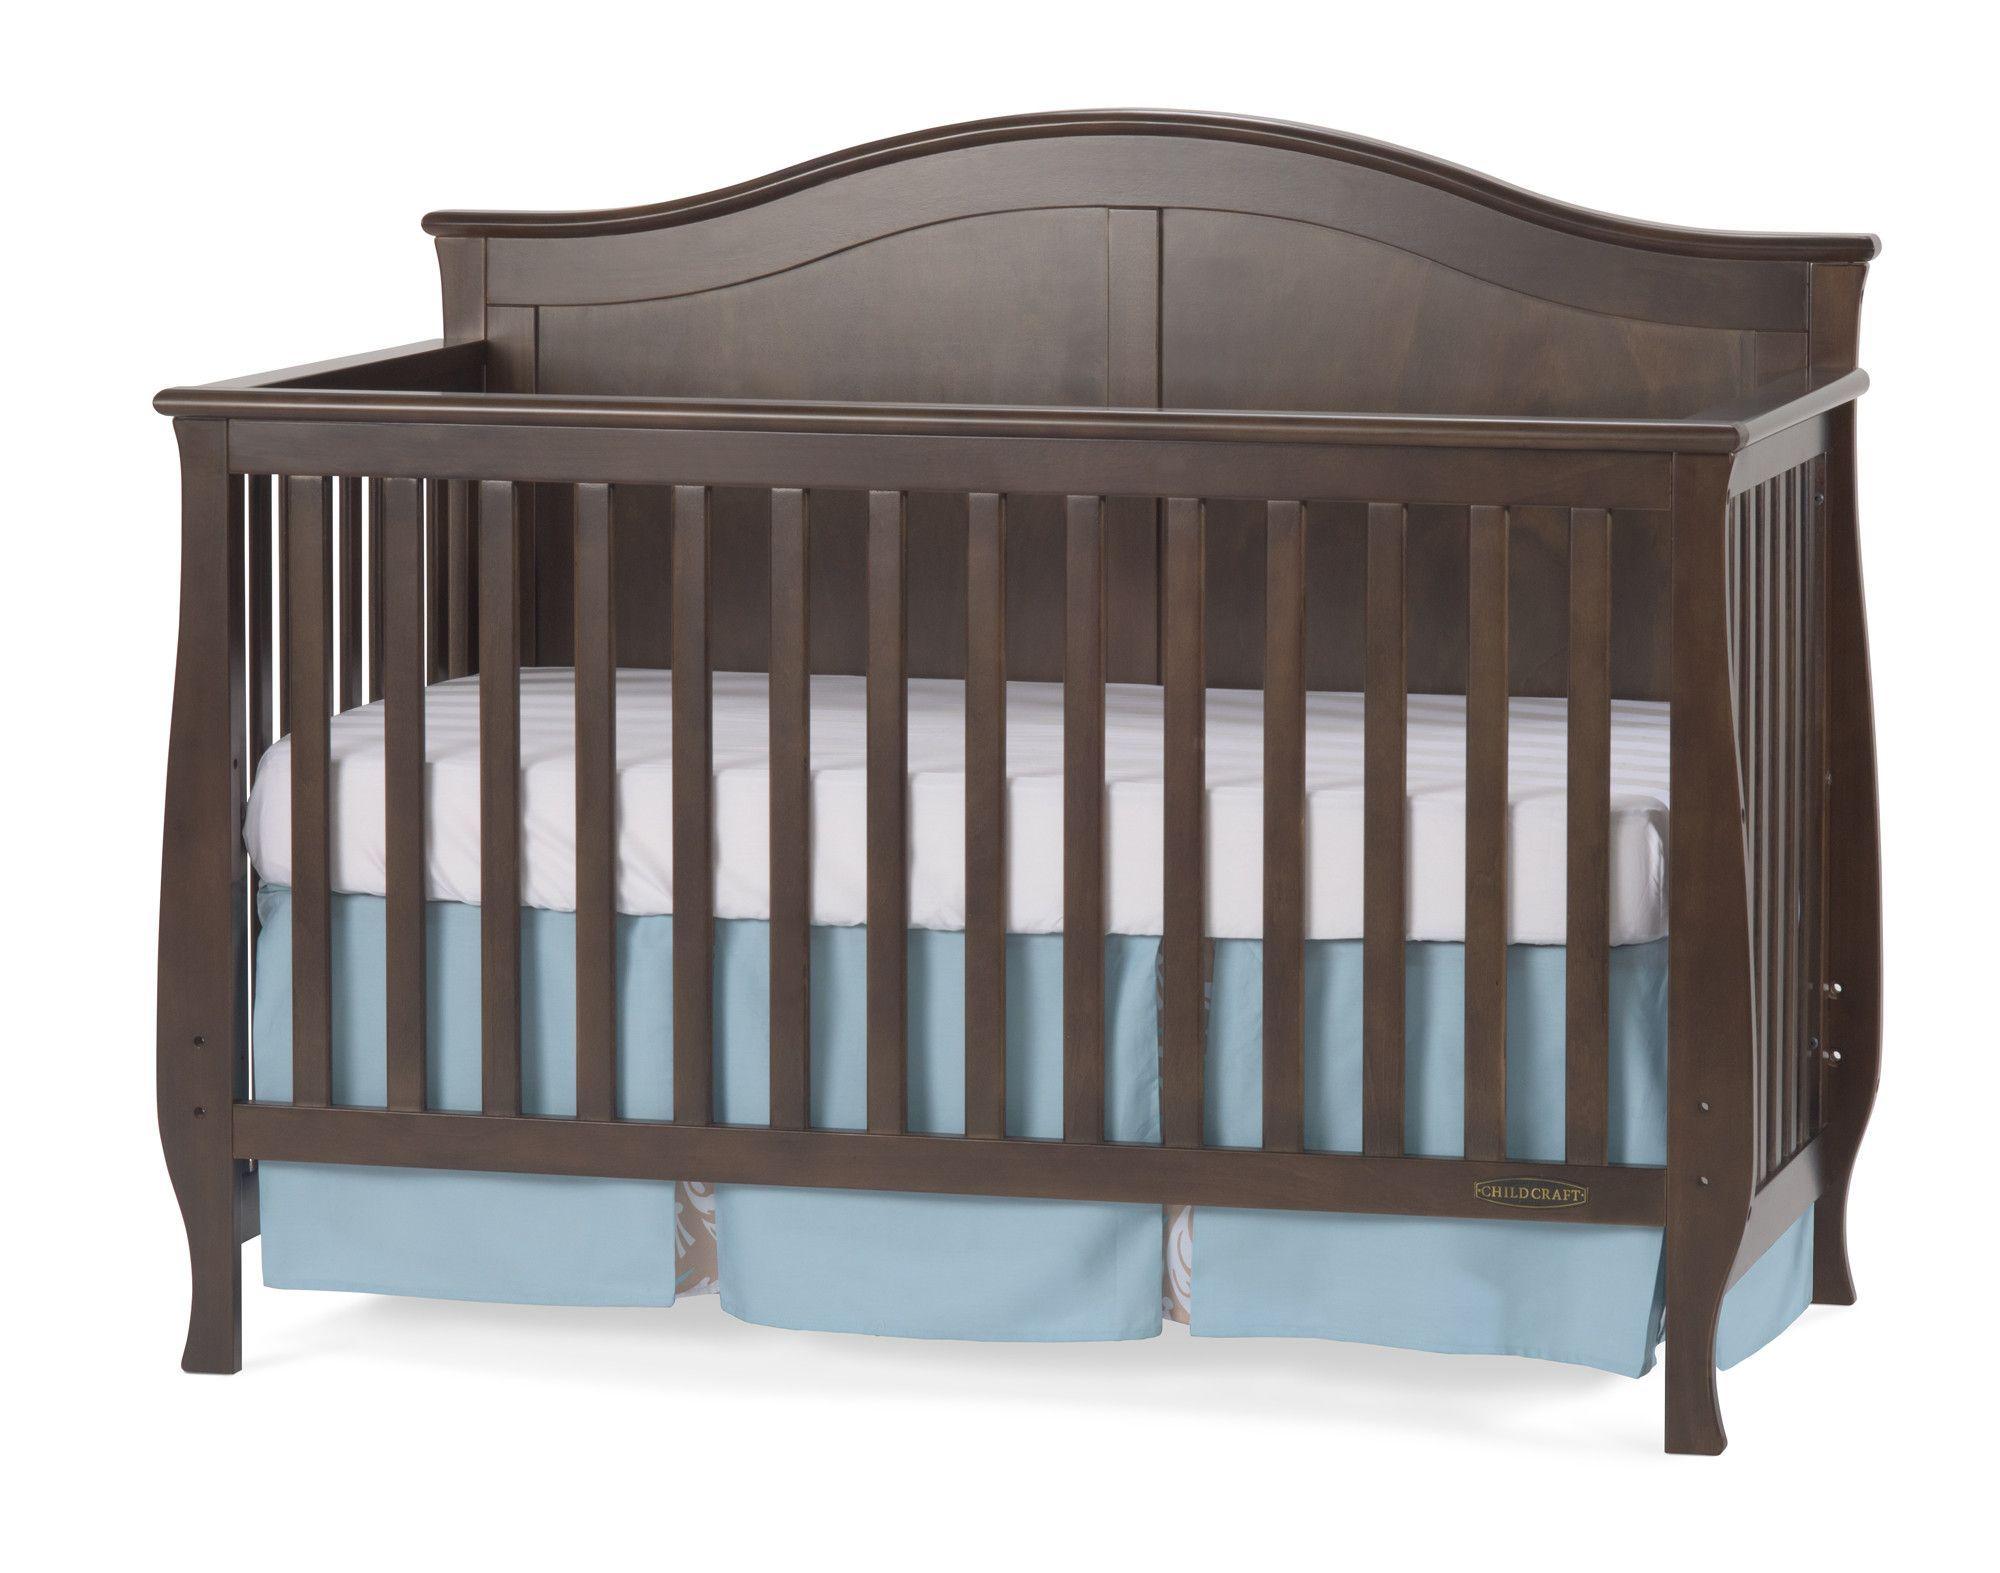 Child Craft Camden 4 In 1 Convertible Crib Baby Cribs Convertible Cribs Convertible Crib